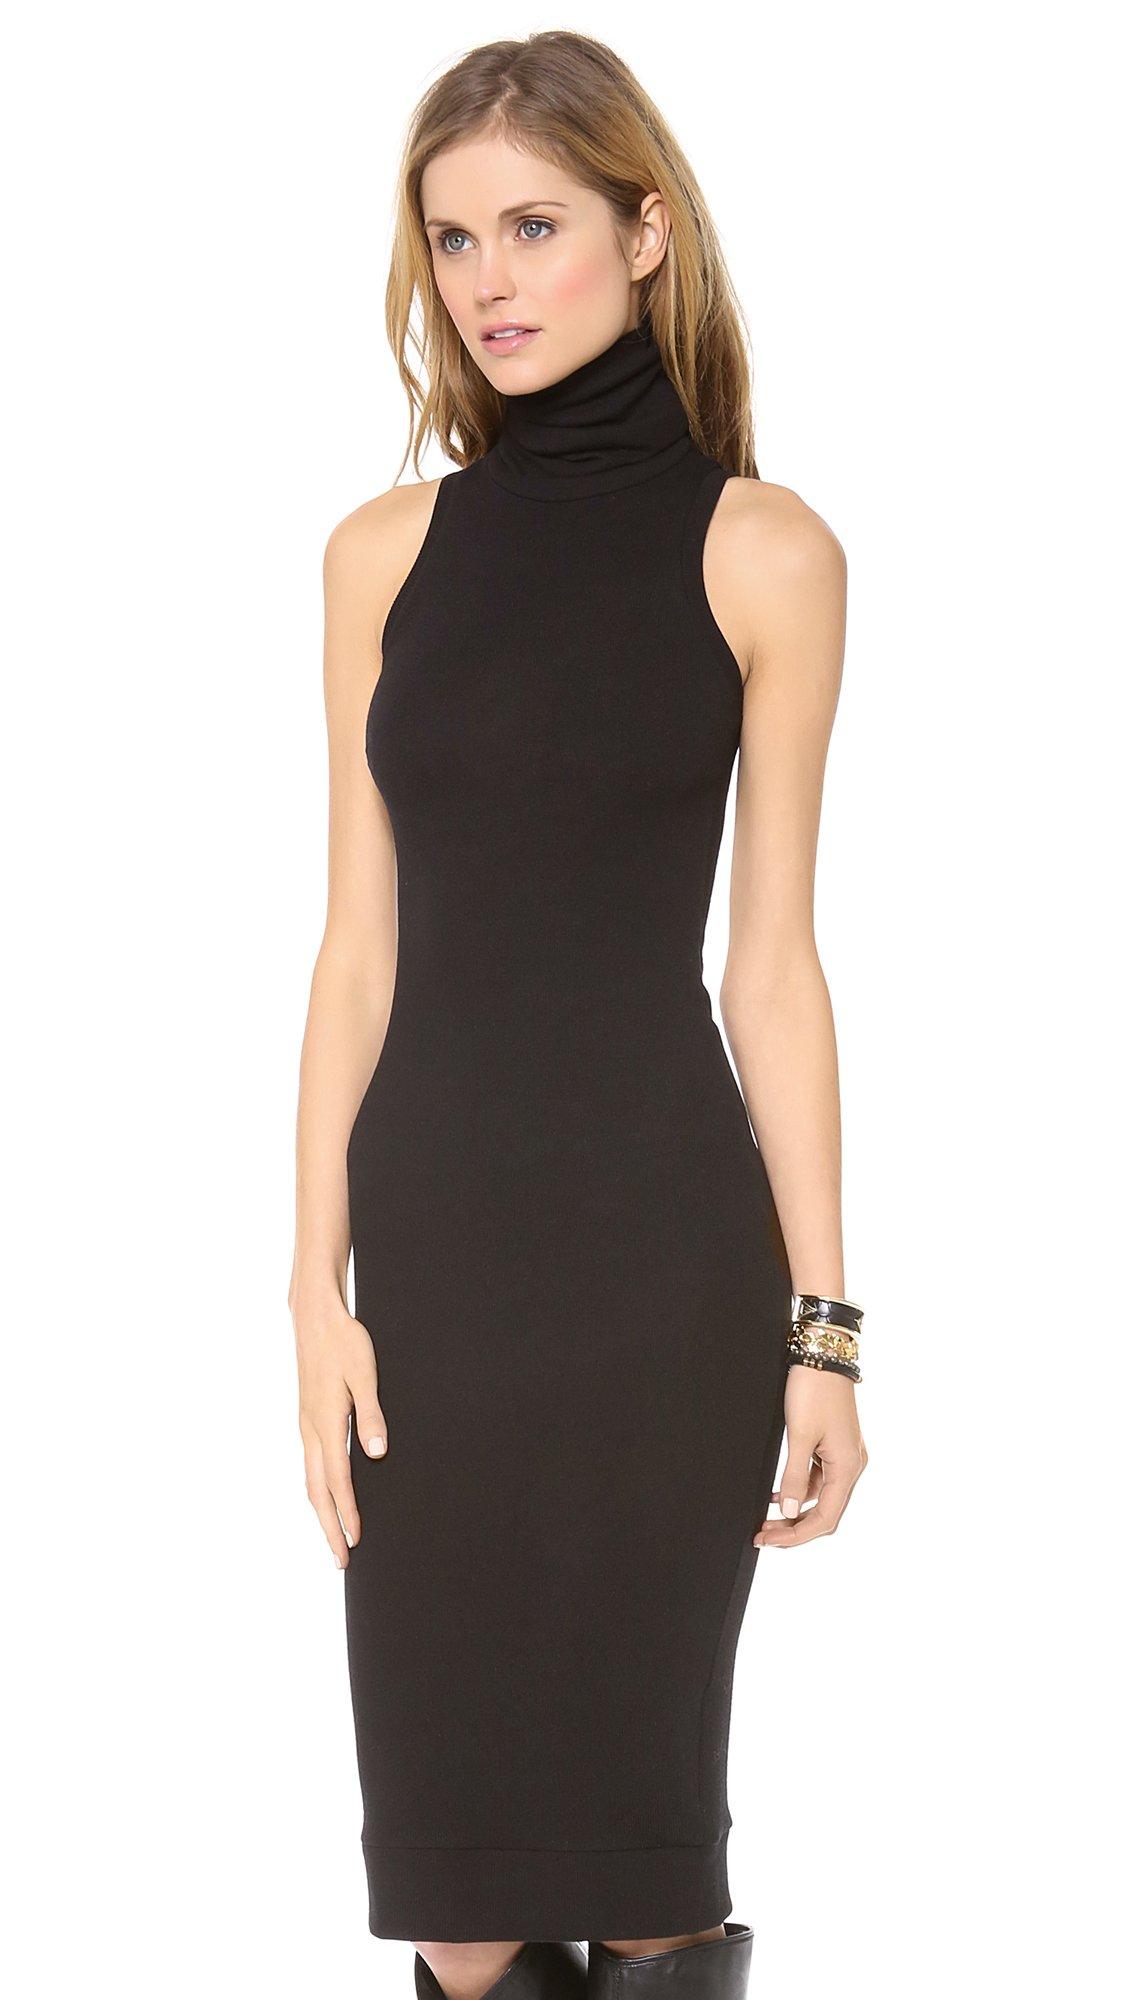 Lyst Rachel Pally Sleeveless Turtleneck Dress Black In